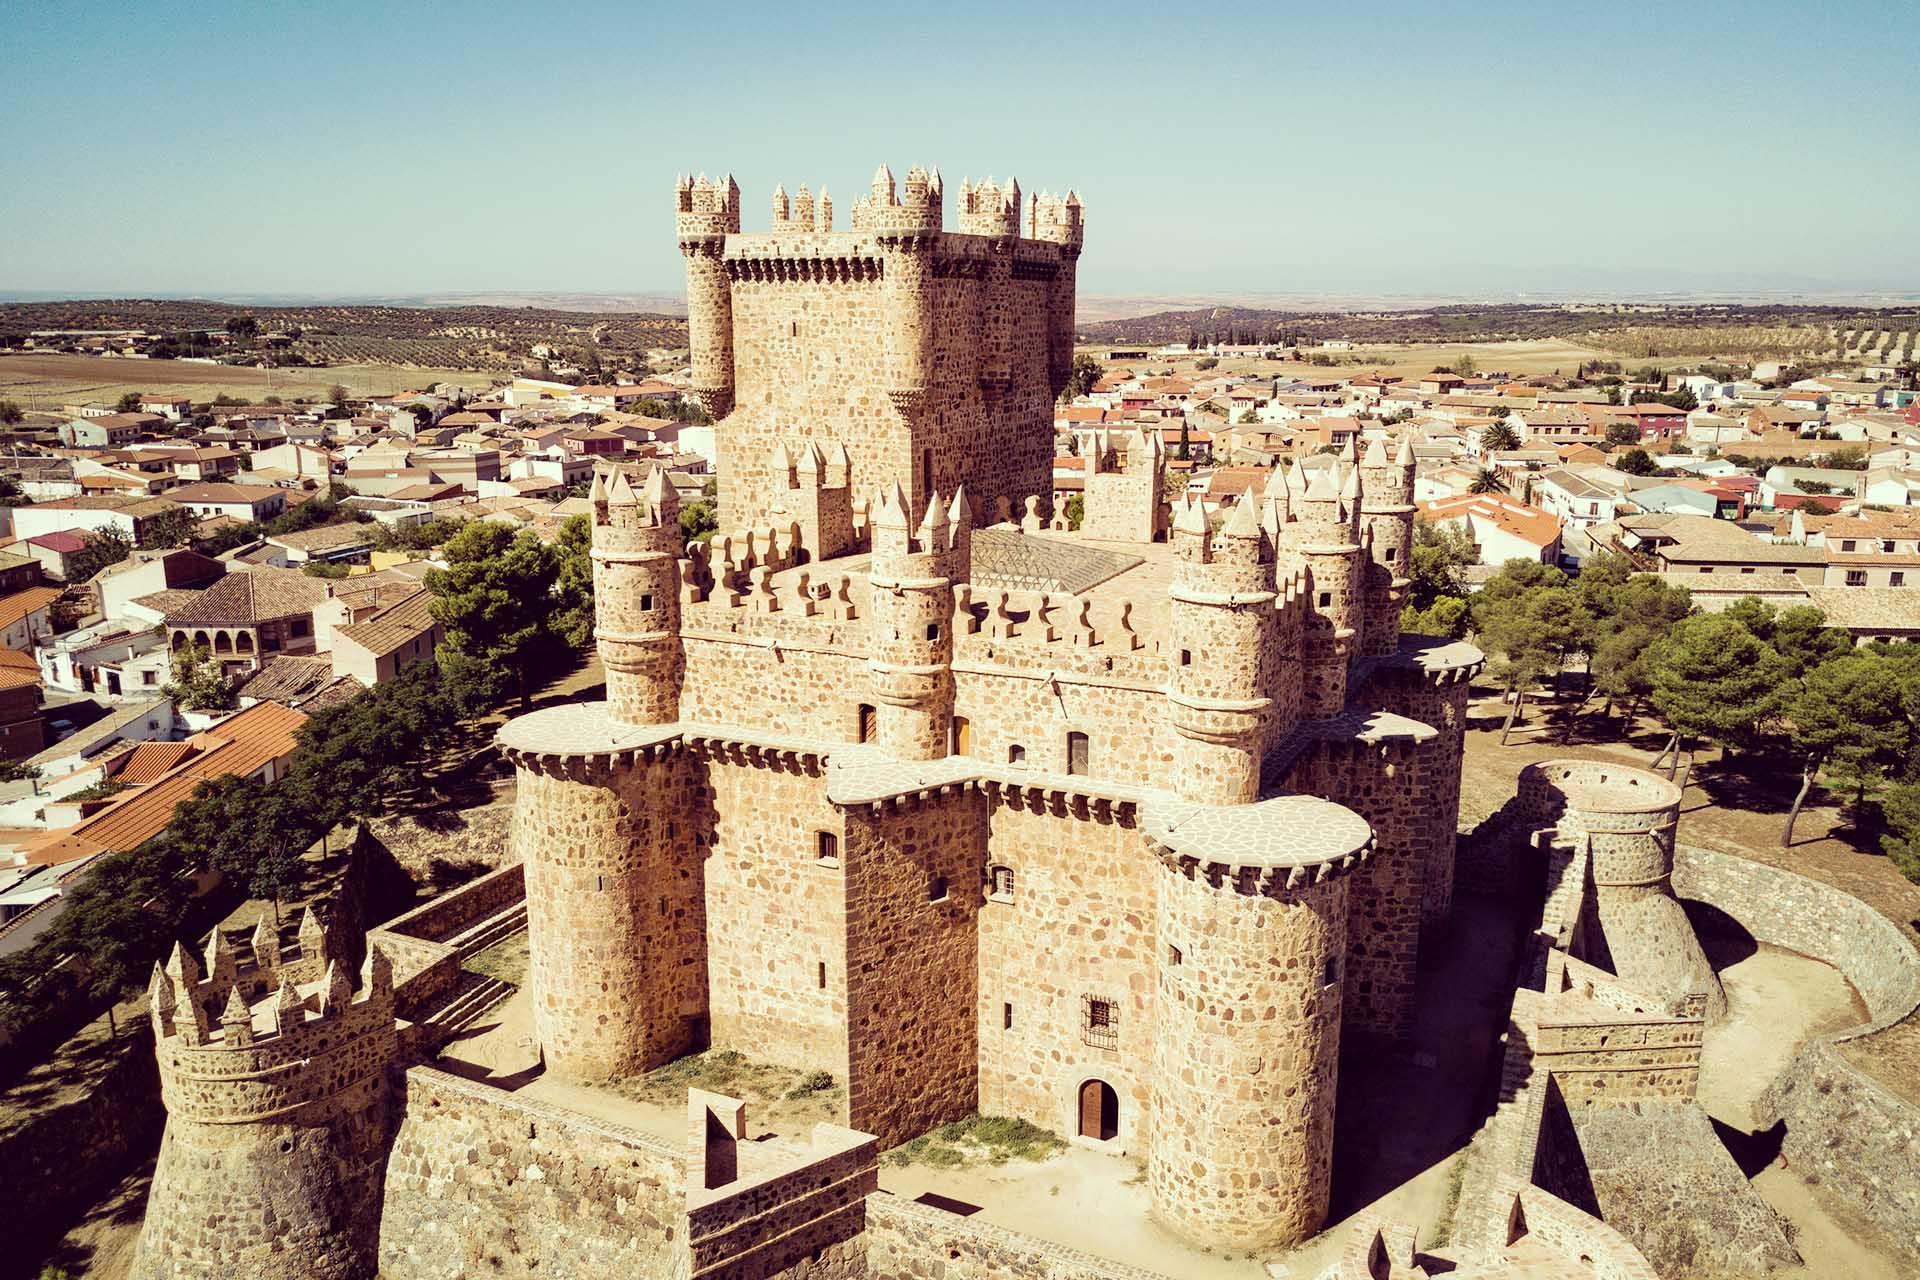 5 castillos de Castilla-La Mancha con mucha historia